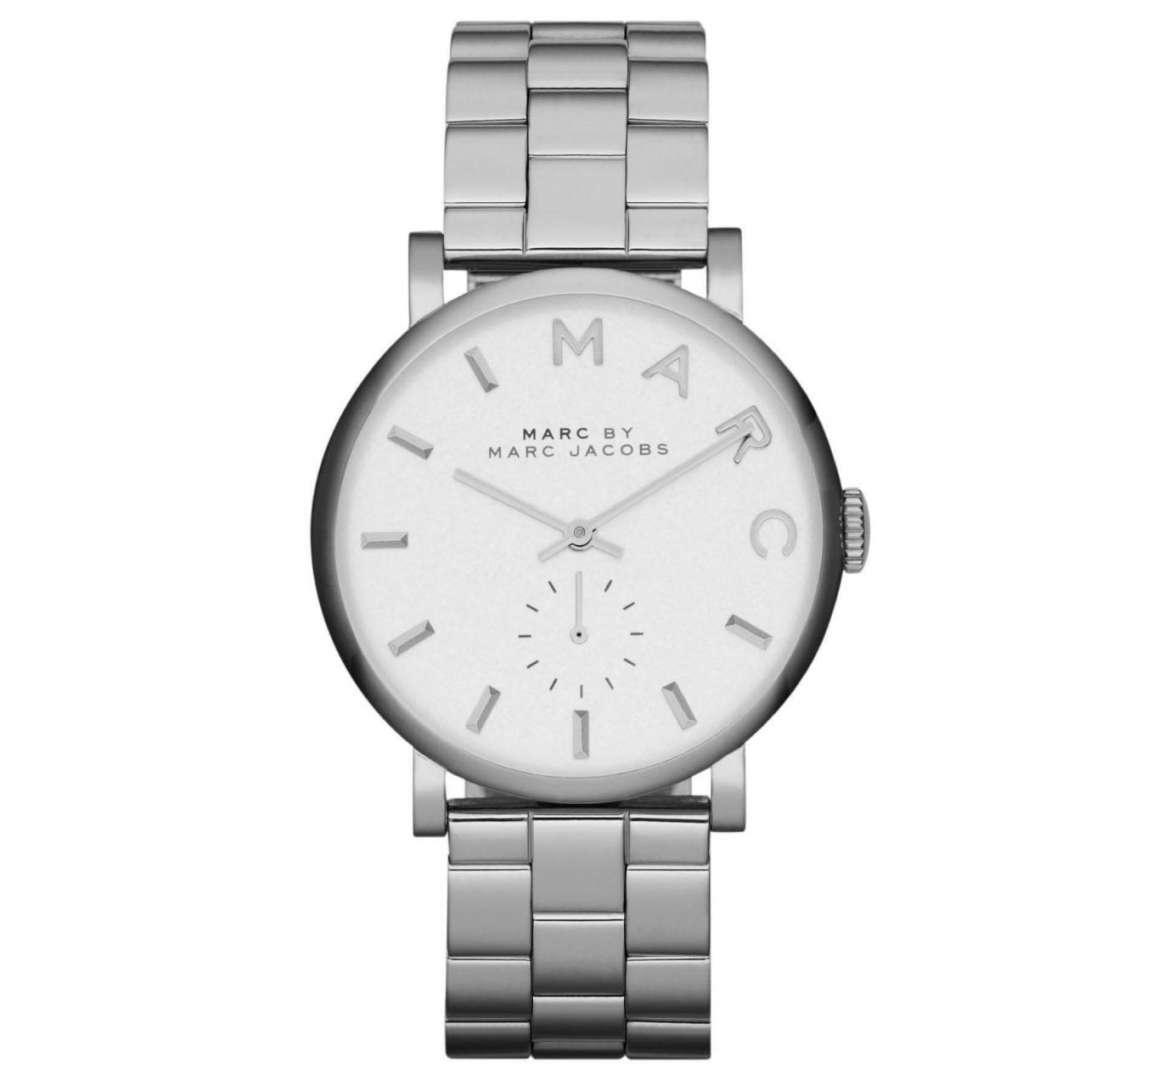 שעון יד אנלוגי mark jacobs דגם: mbm3242 מארק ג'ייקובס